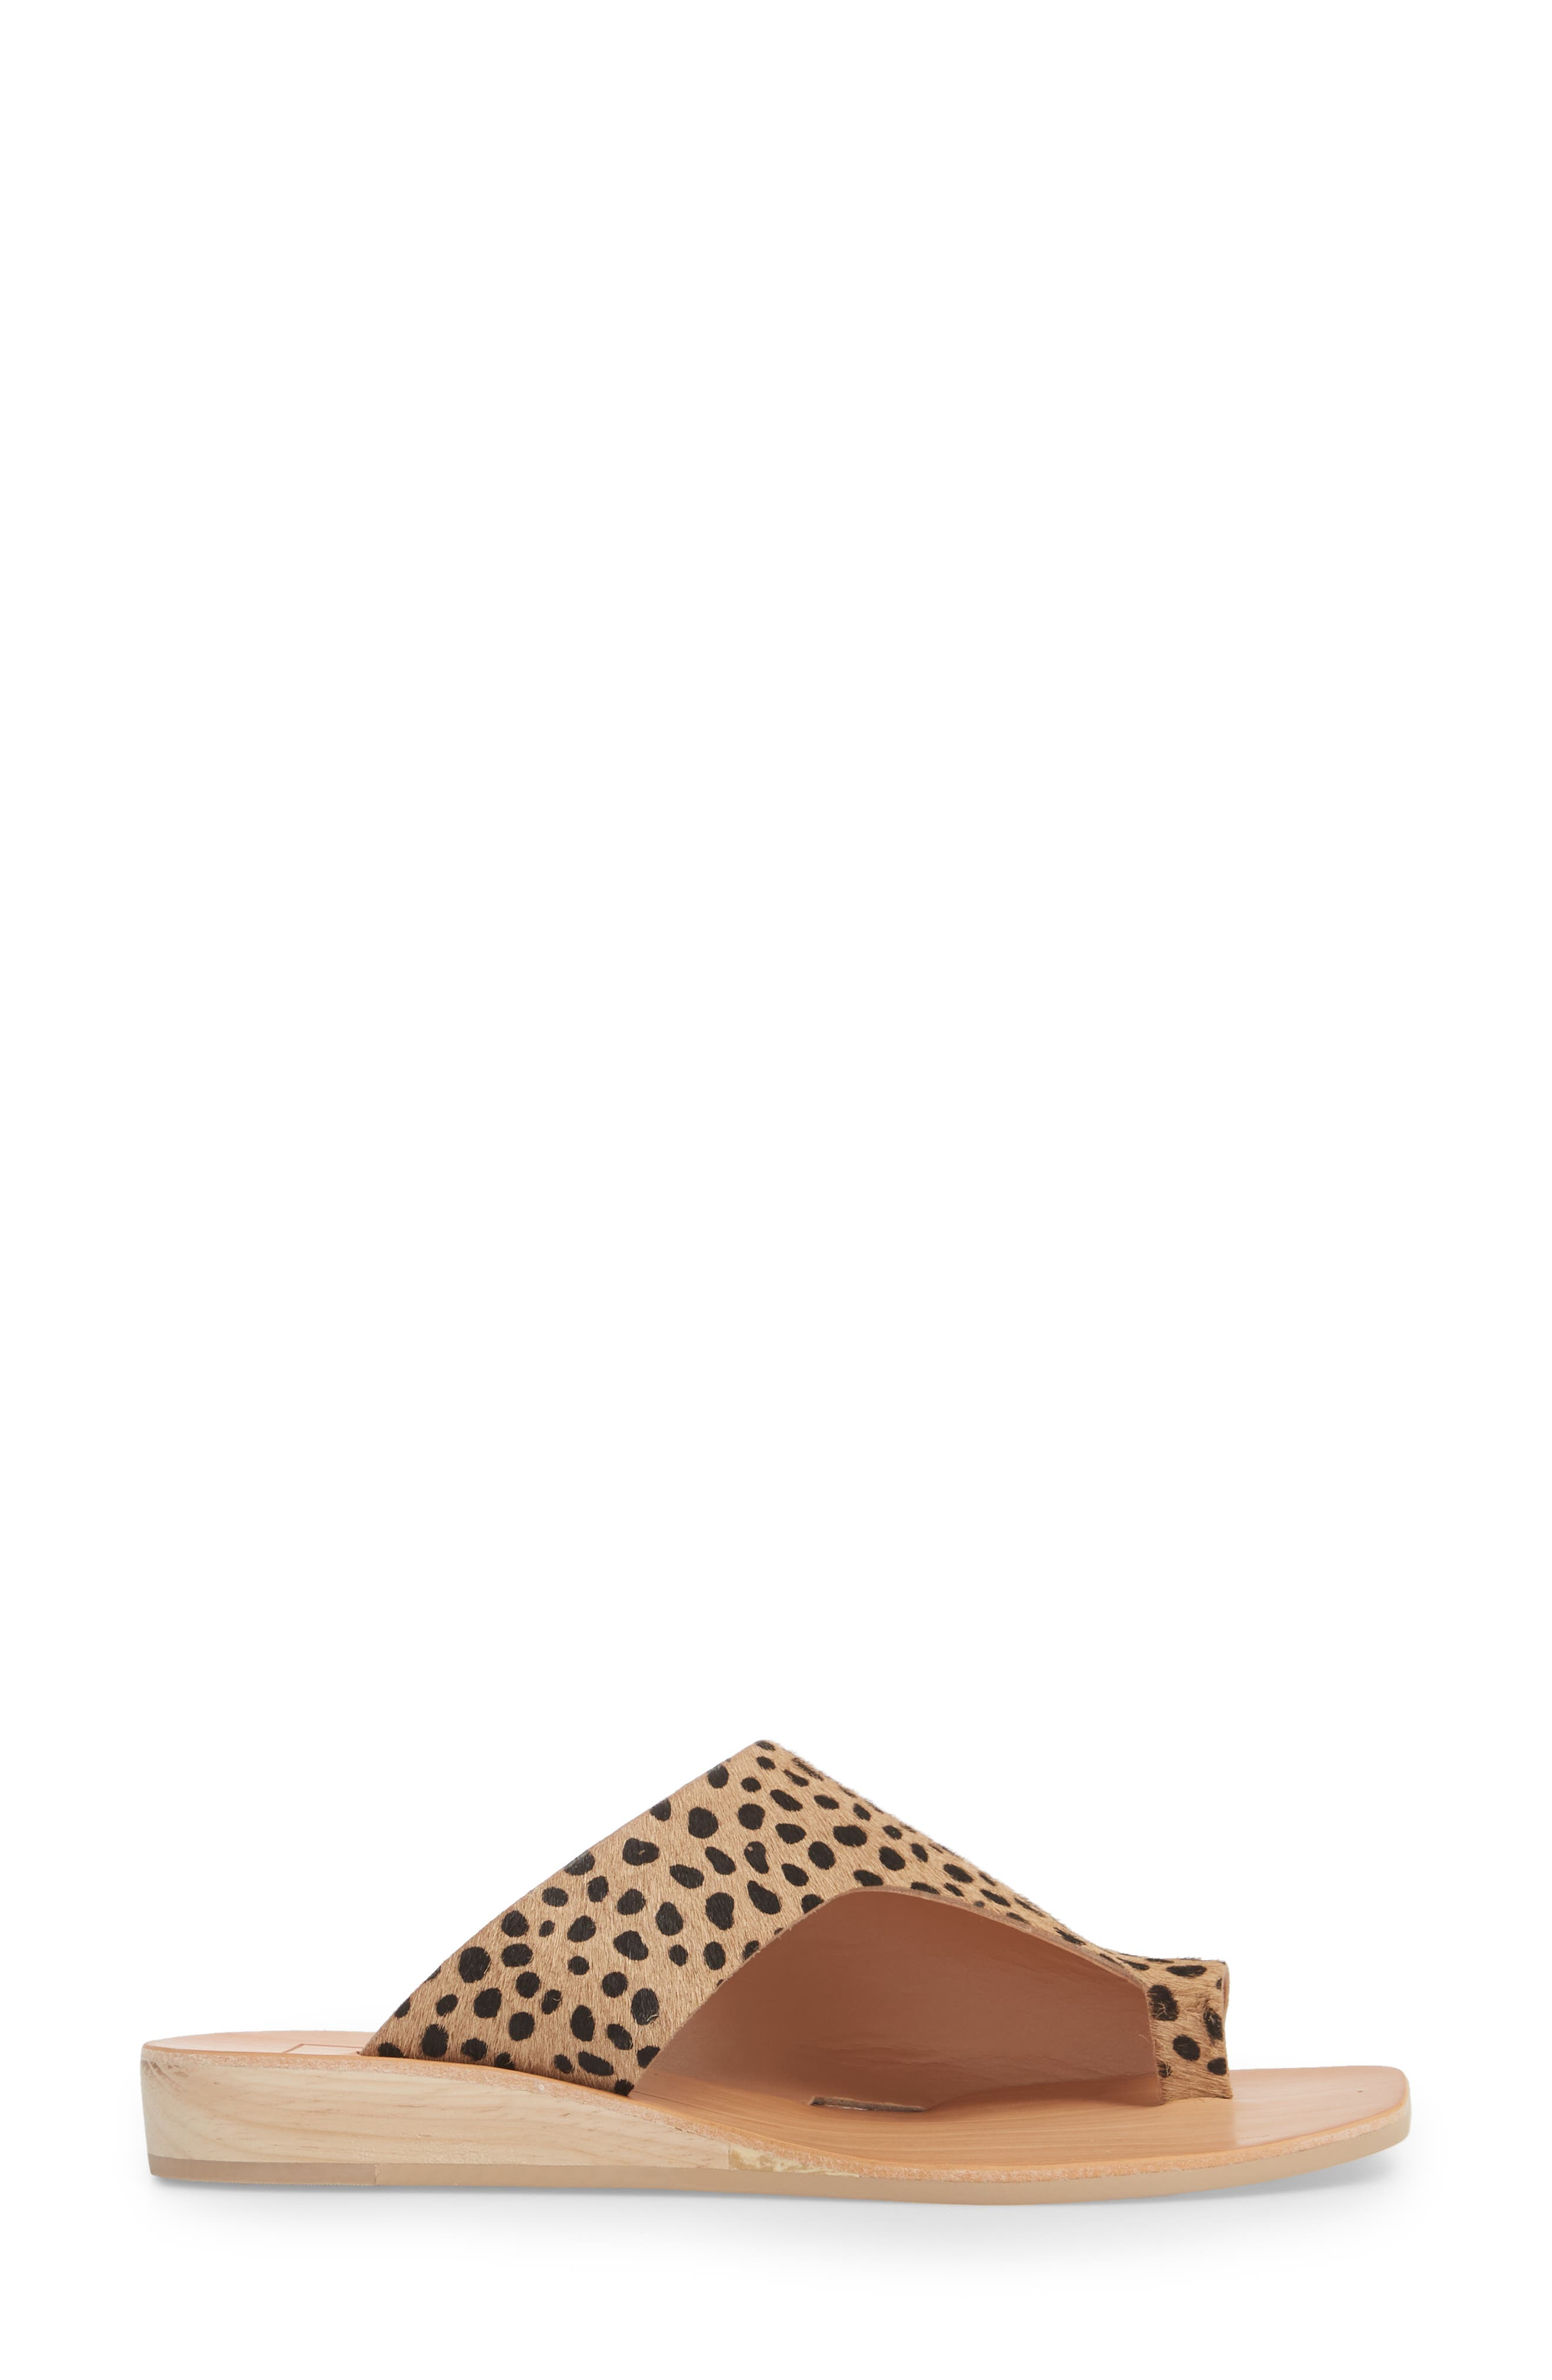 Hazle Genuine Calf Hair Sandal,                             Alternate thumbnail 9, color,